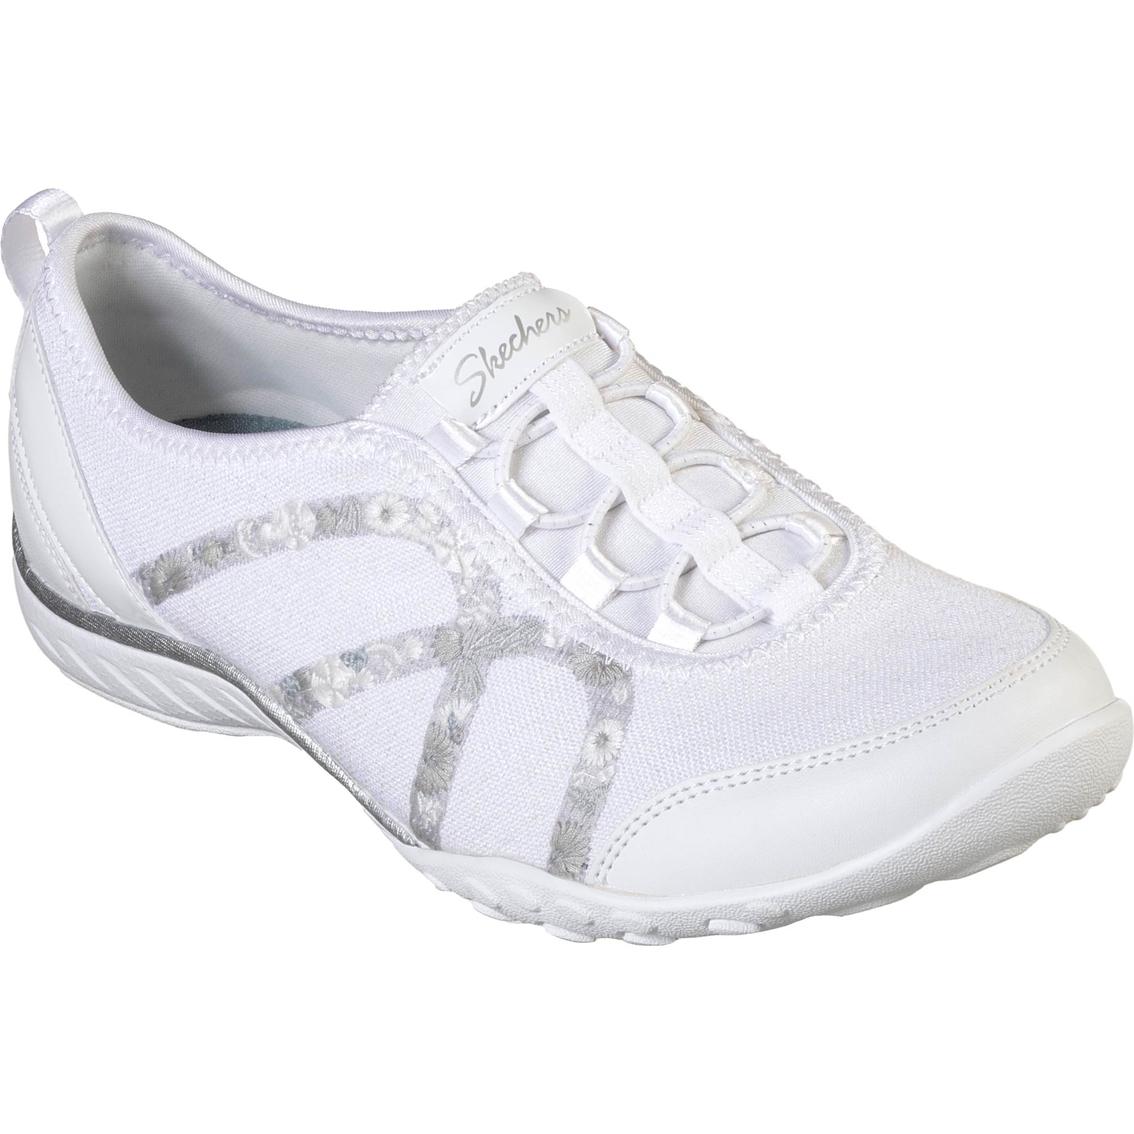 Outlet-Verkauf exquisites Design aliexpress Skechers Women's Breathe Easy Garden Joy Shoes   Casuals ...